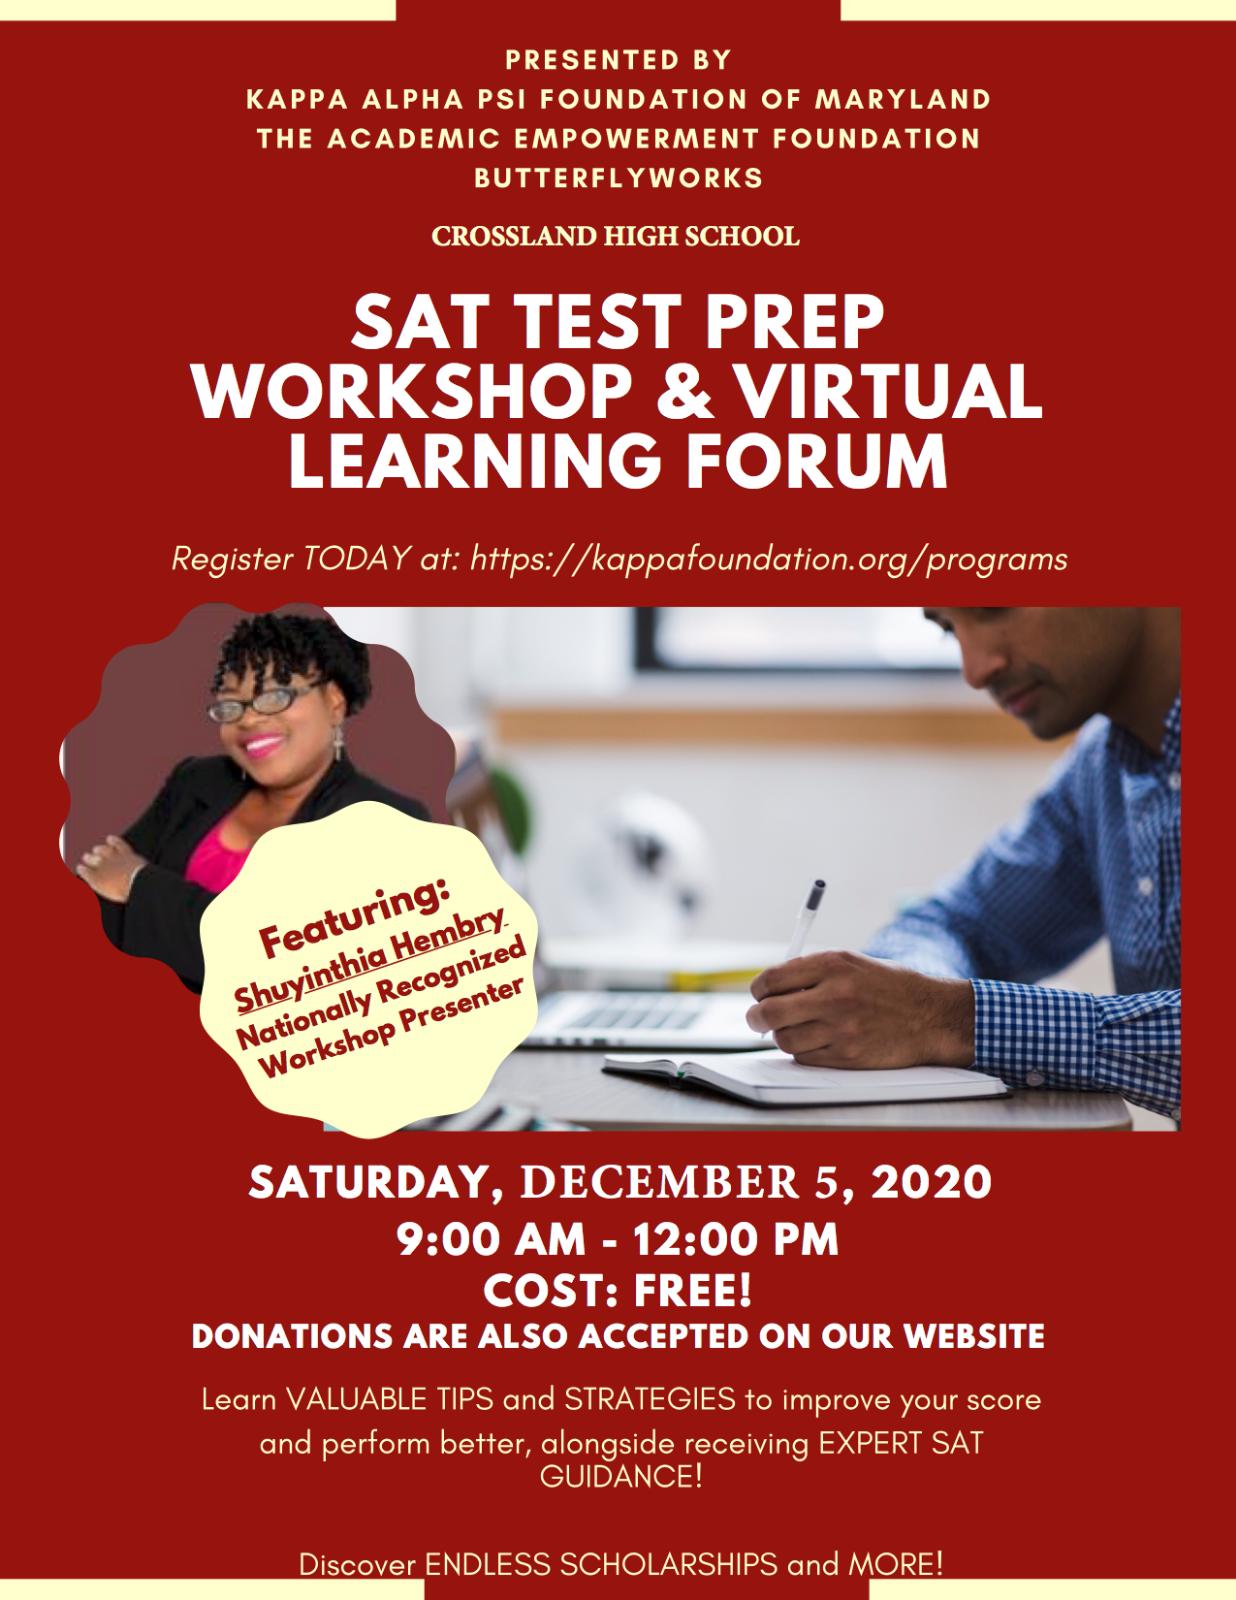 Free SAT Workshop this Saturday